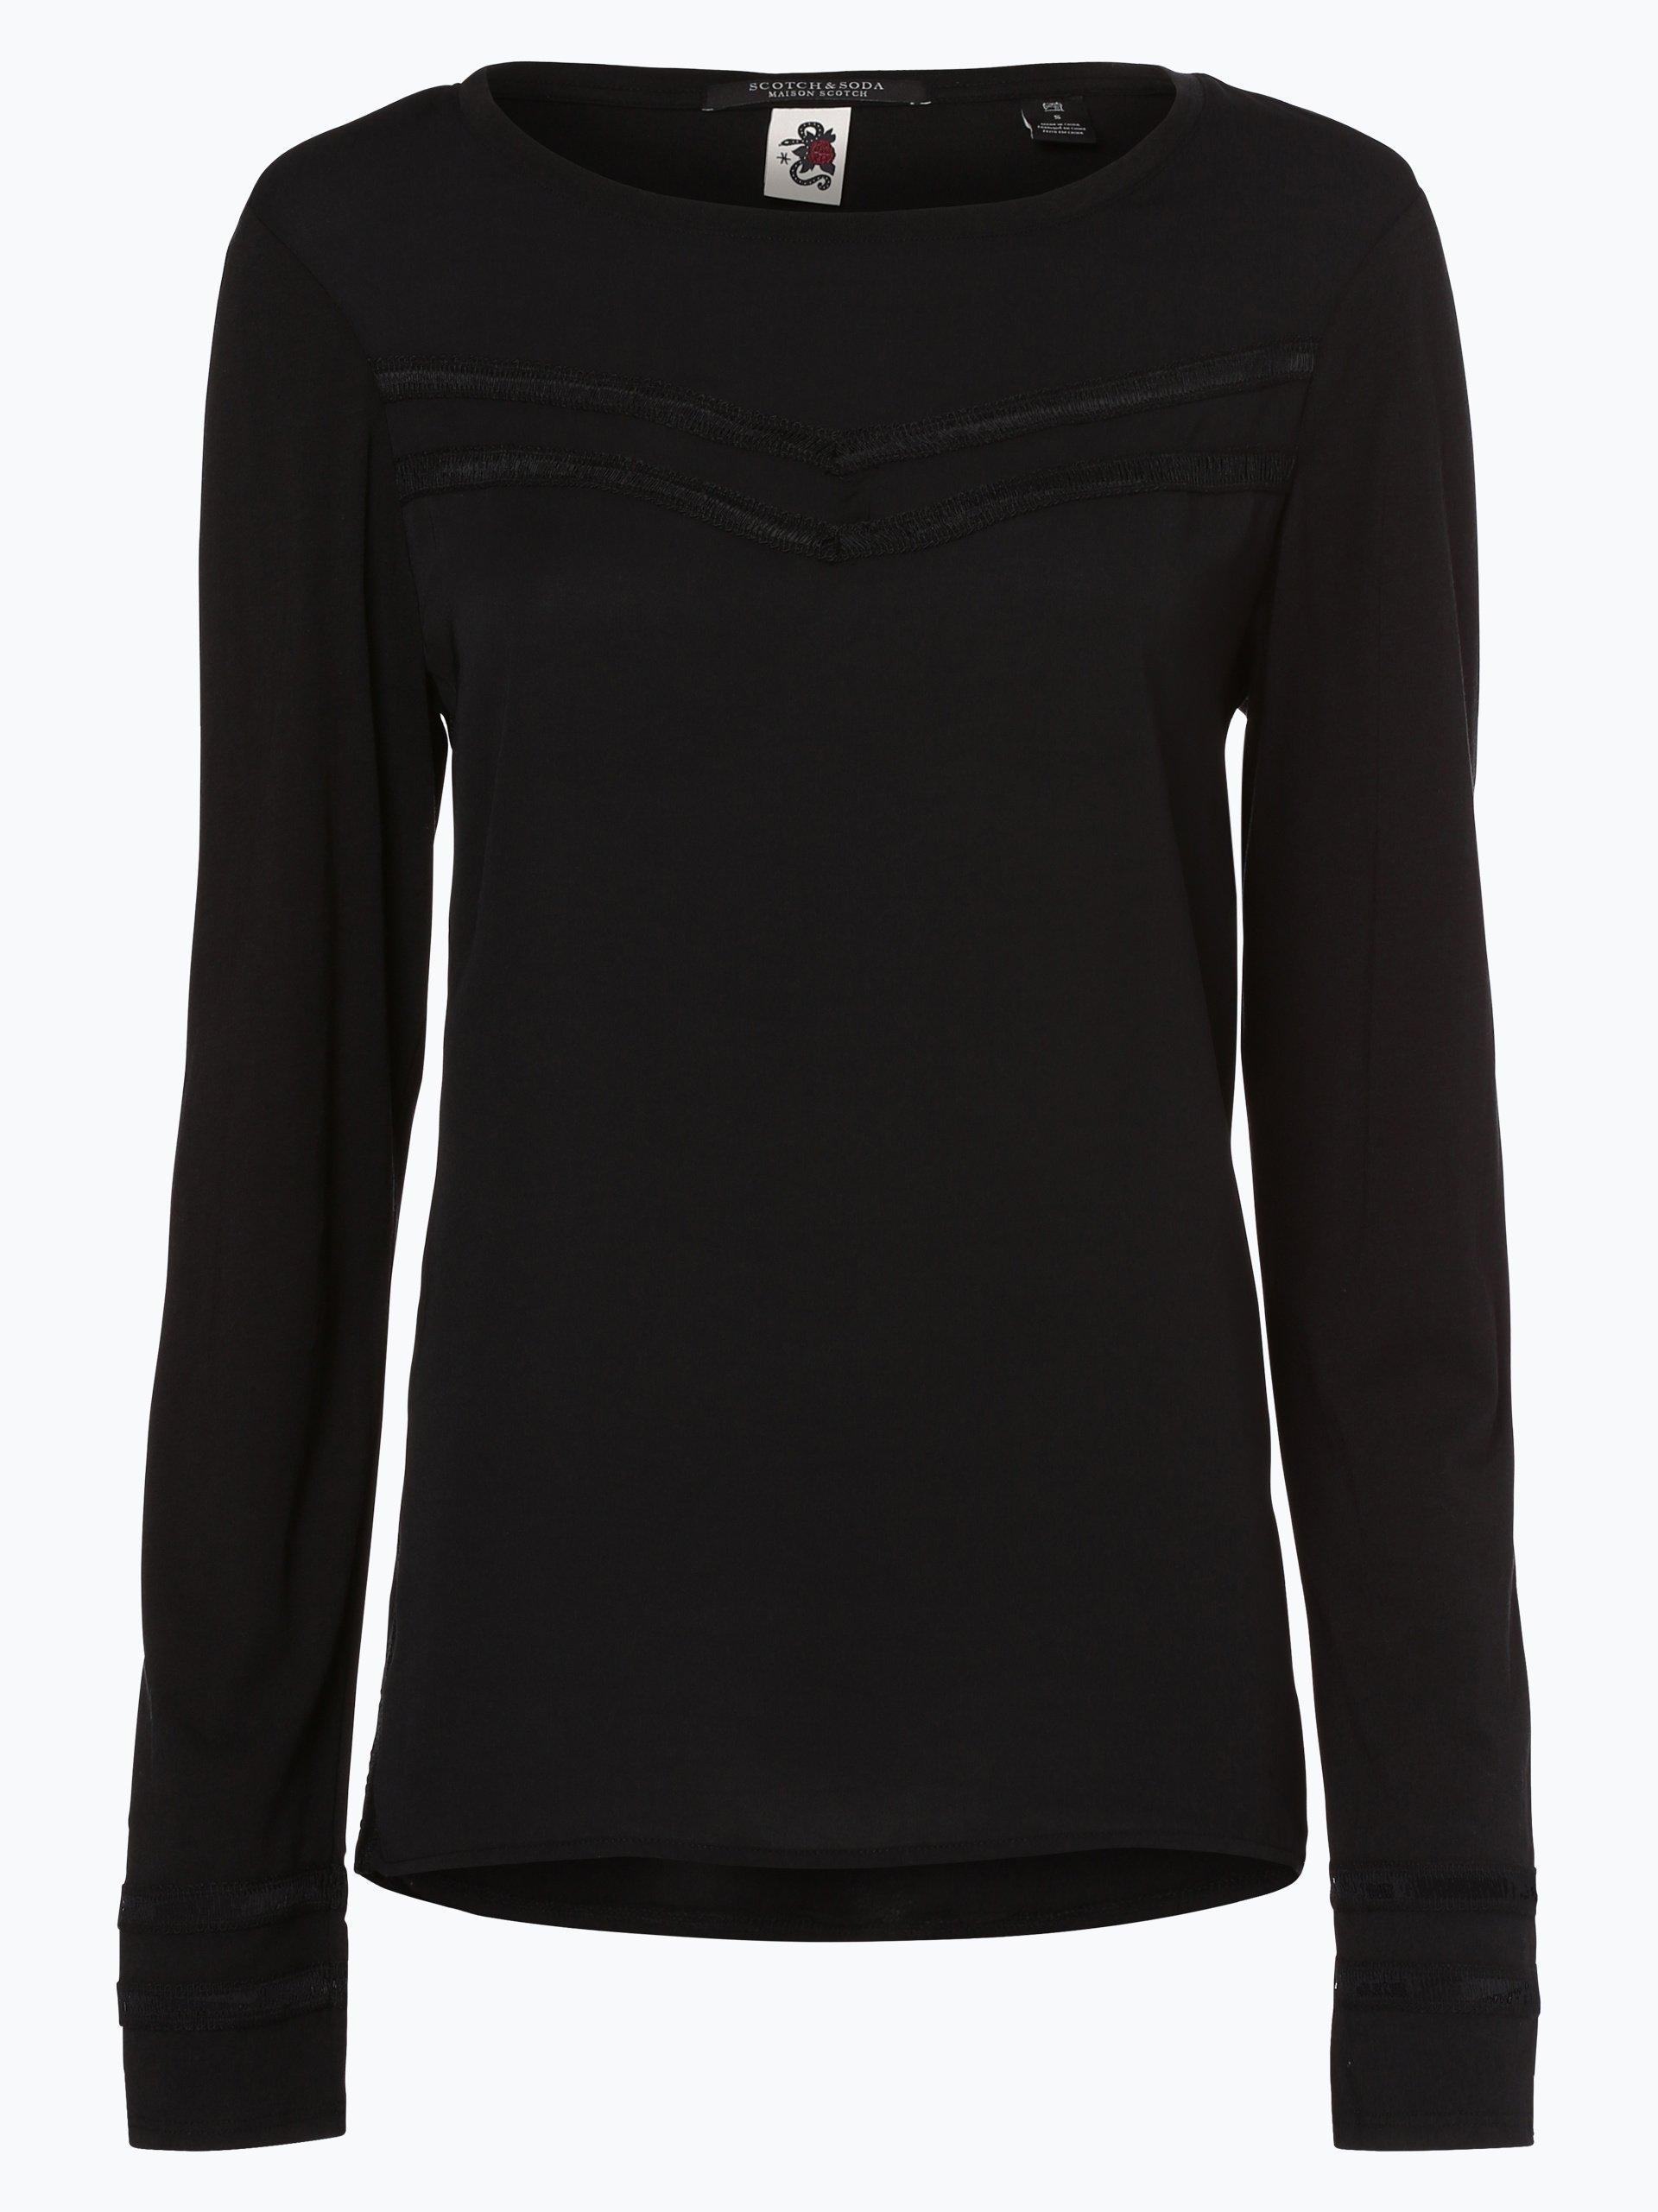 scotch soda damen langarmshirt 2 online kaufen peek und cloppenburg de. Black Bedroom Furniture Sets. Home Design Ideas